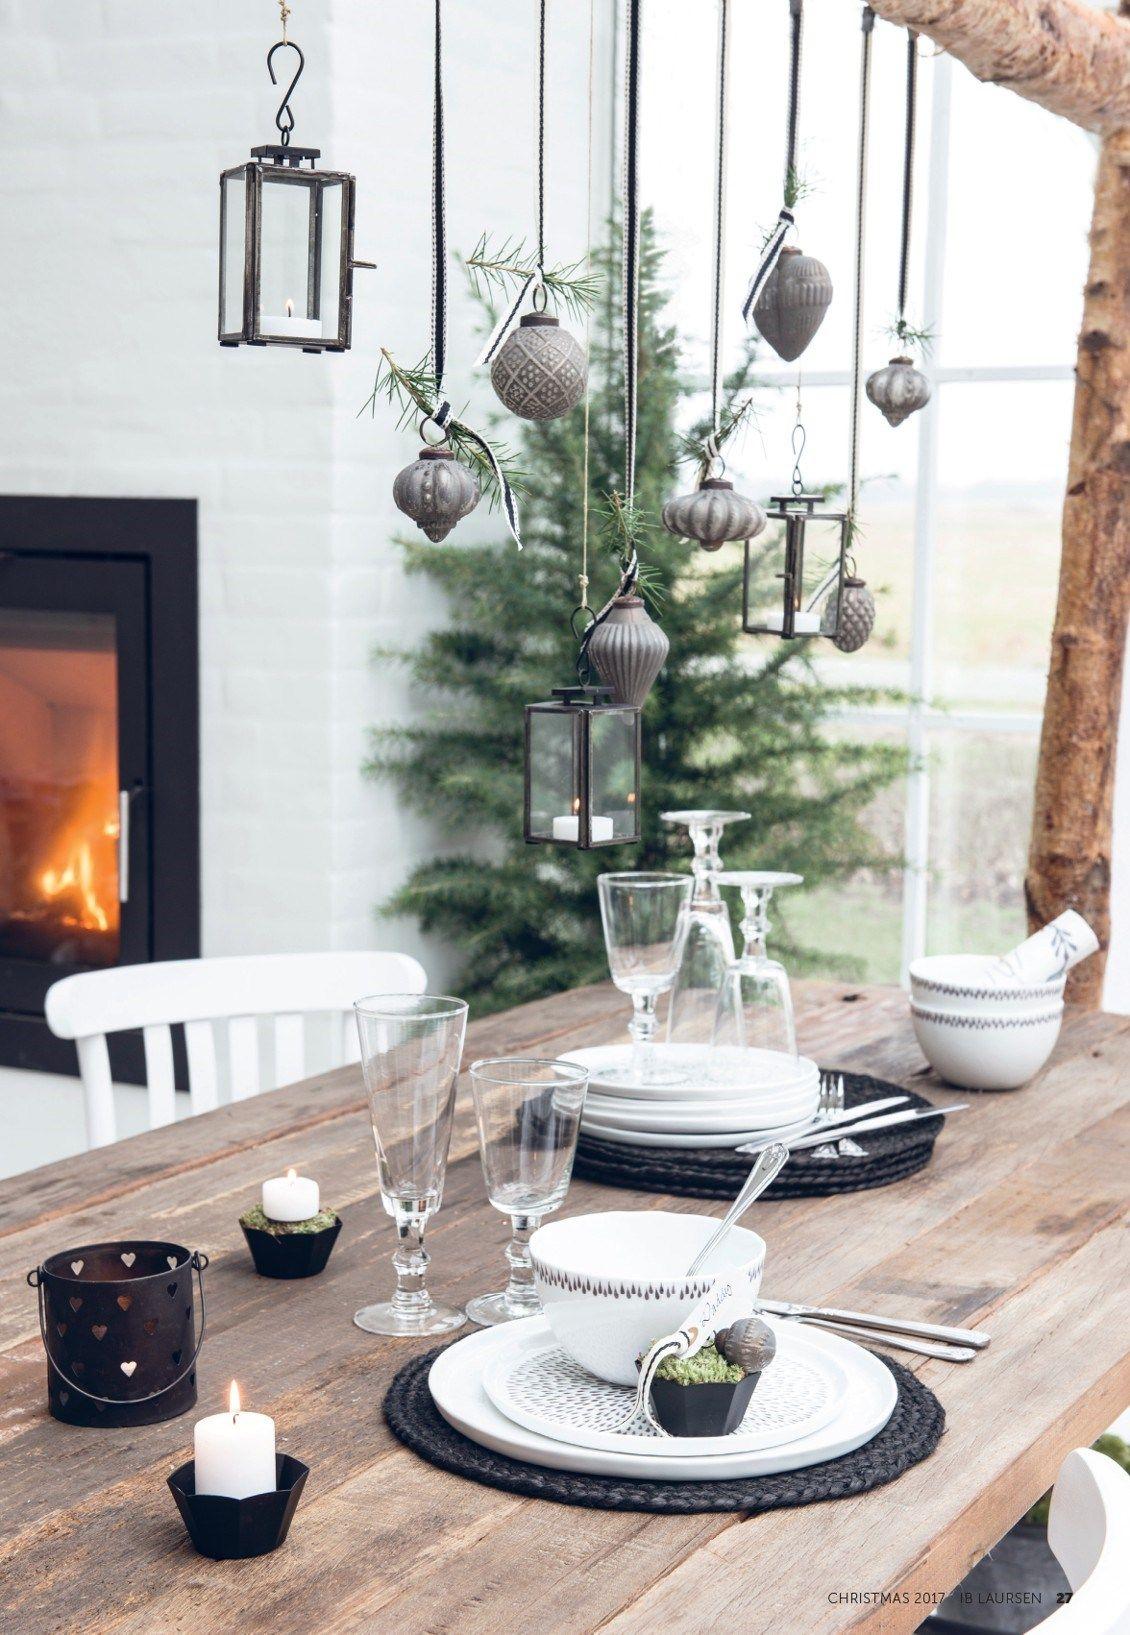 Tischdeko Weihnachten Ib Laursen Christmas Hygge Kerst